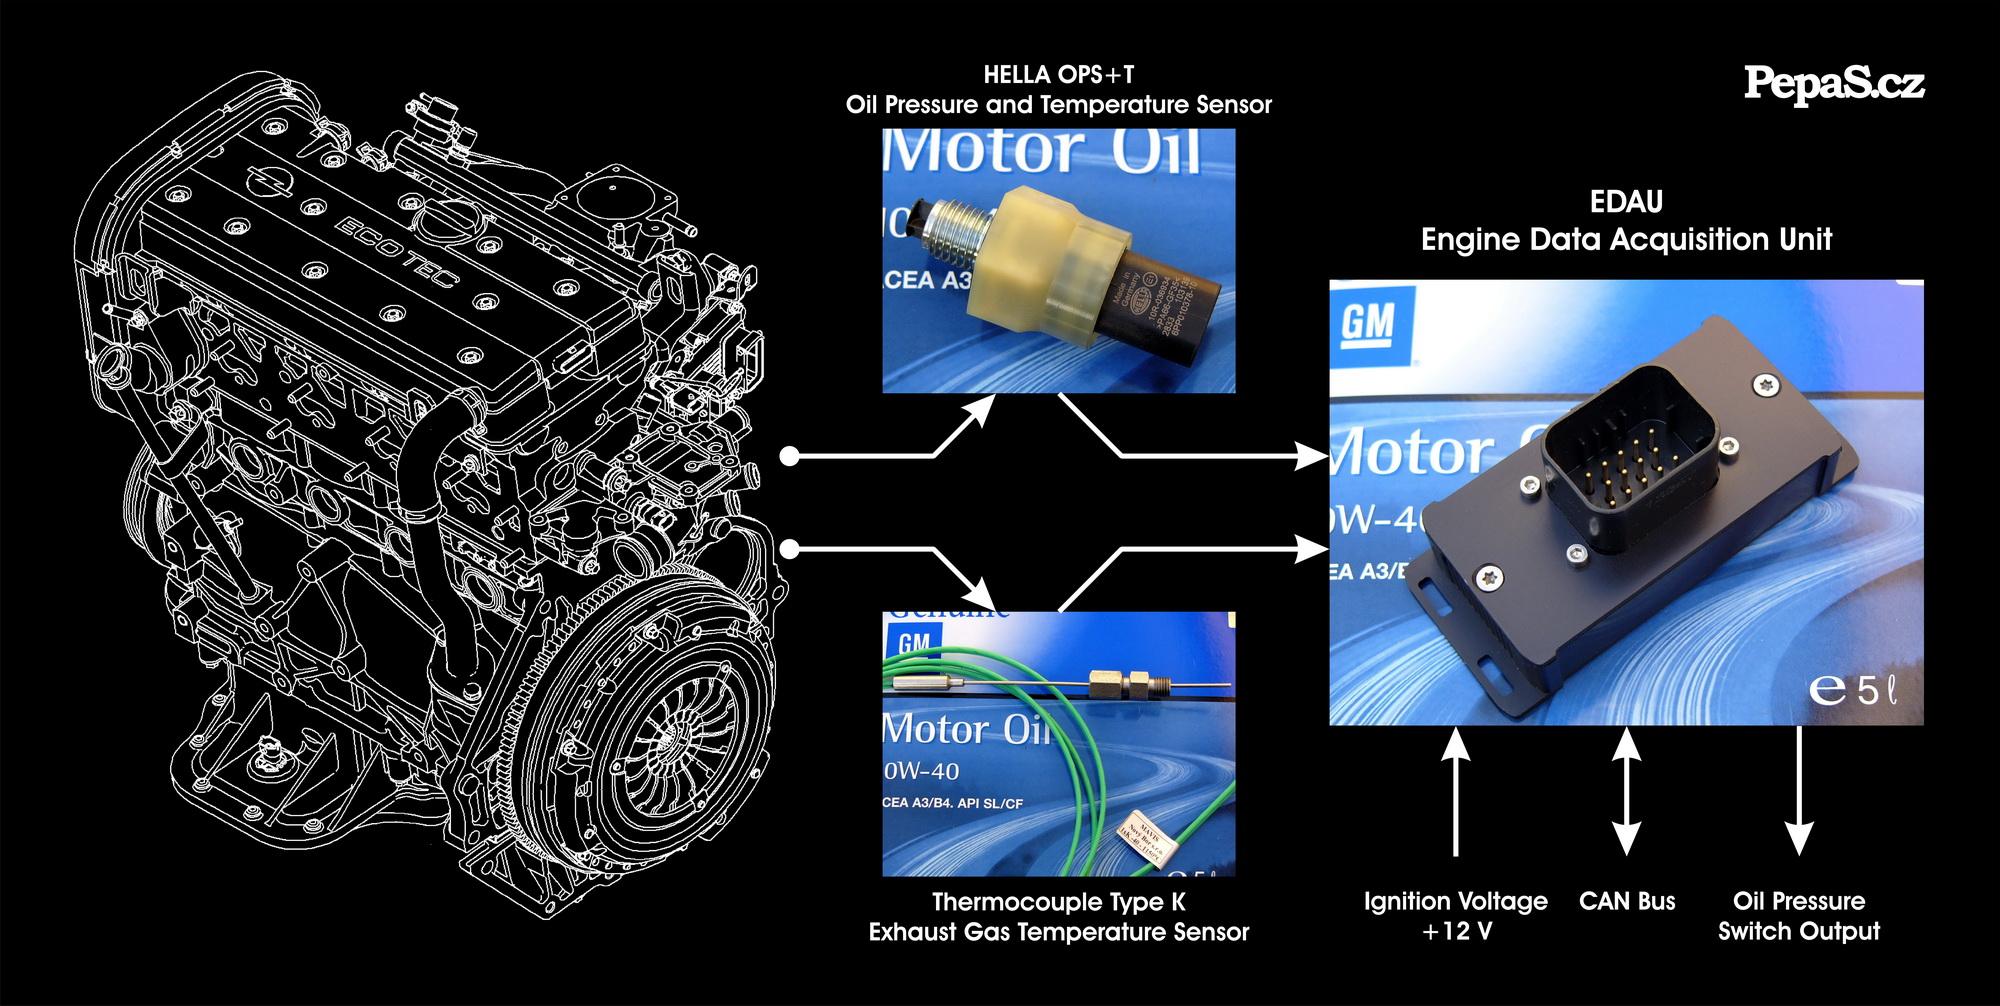 Ilustrovaný blokový diagram instalace modulu EDAU (Engine Data Acquisition Unit)